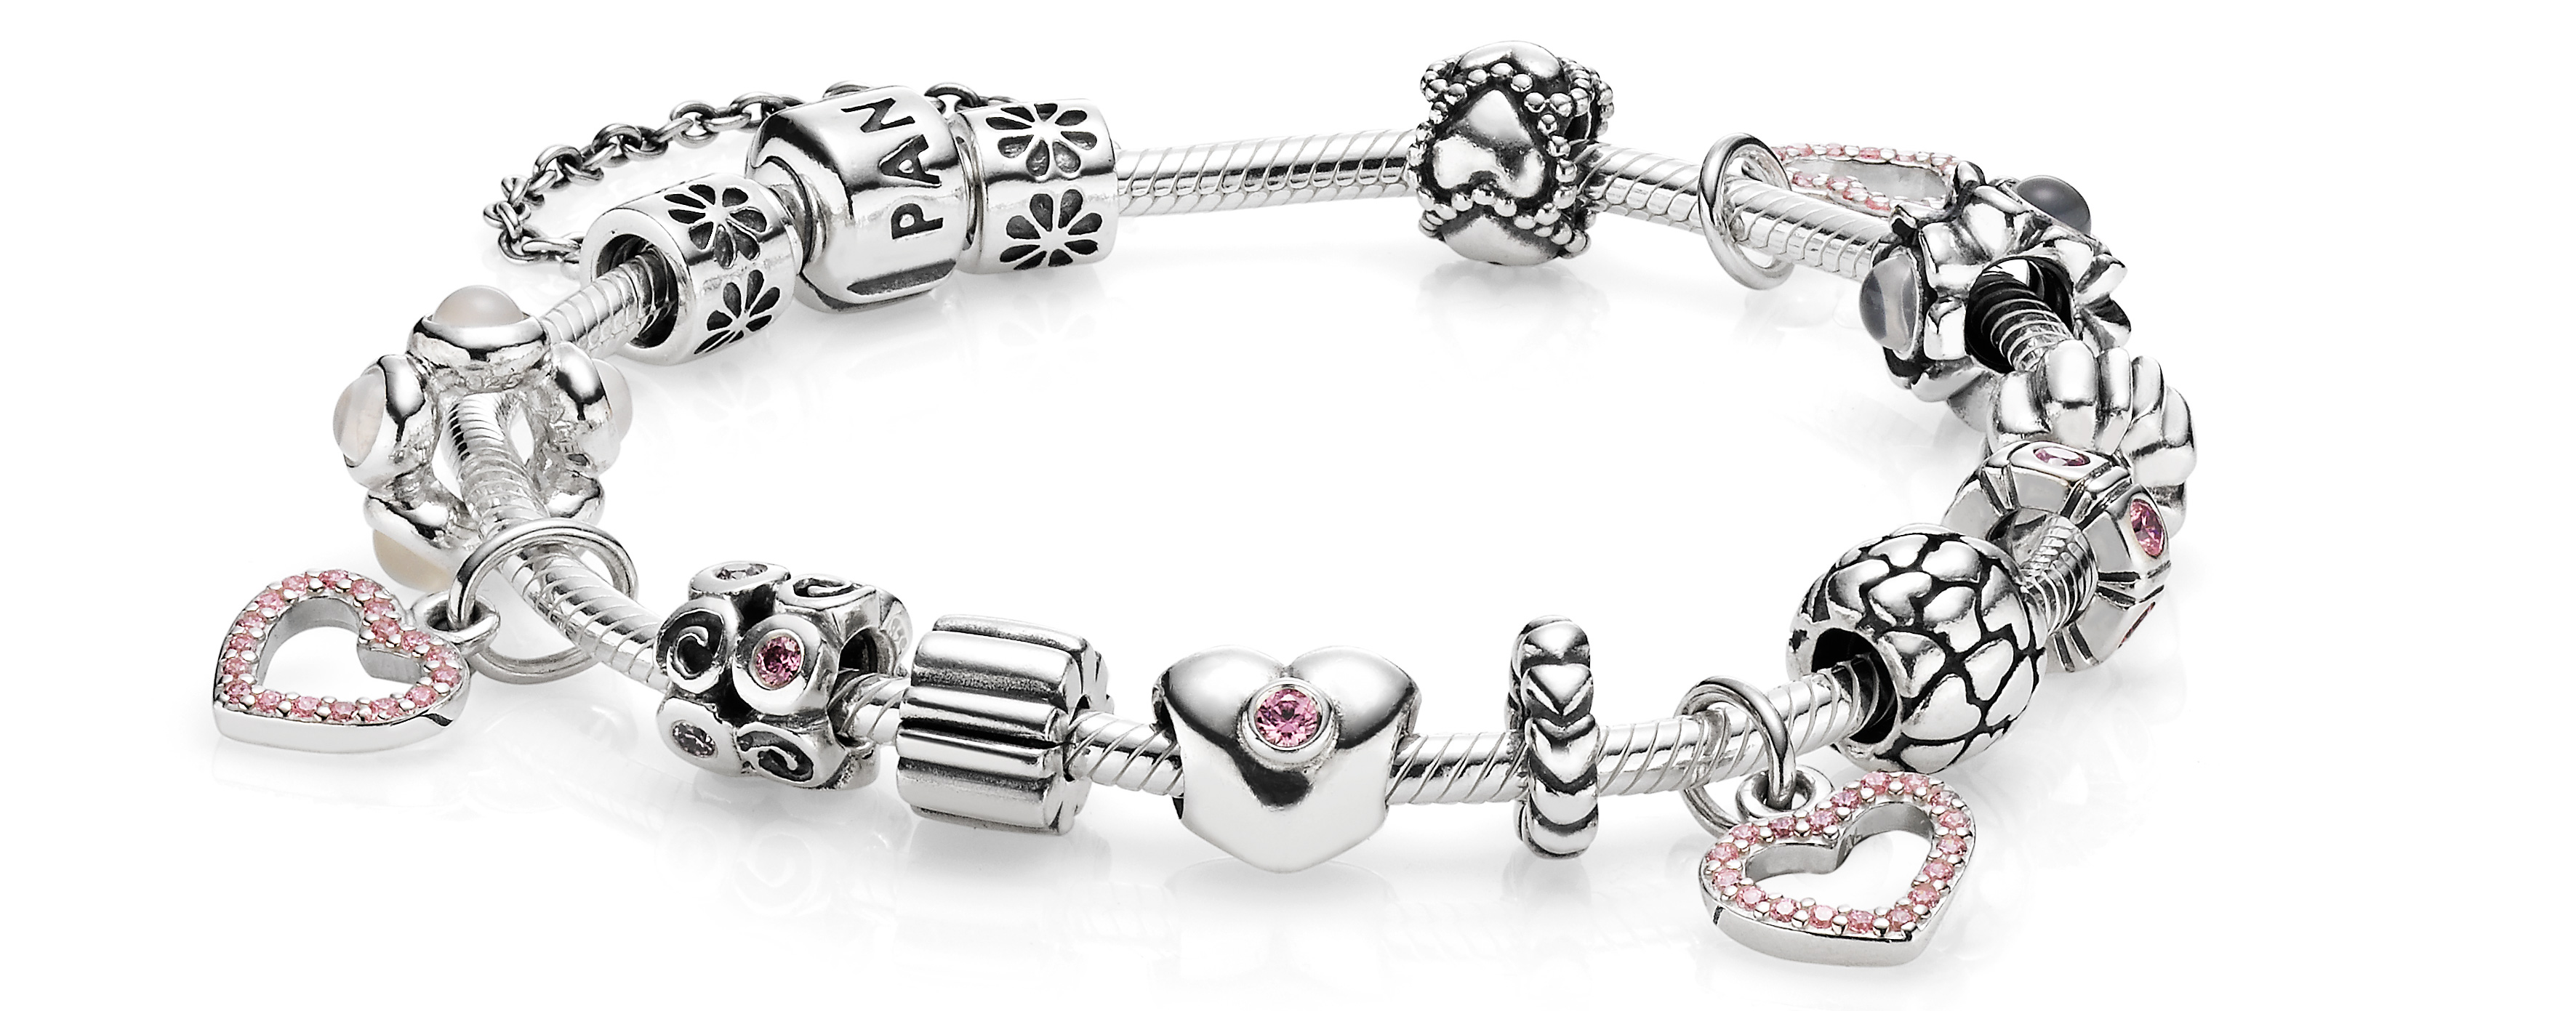 00d81408853ae pandora charms jewelry